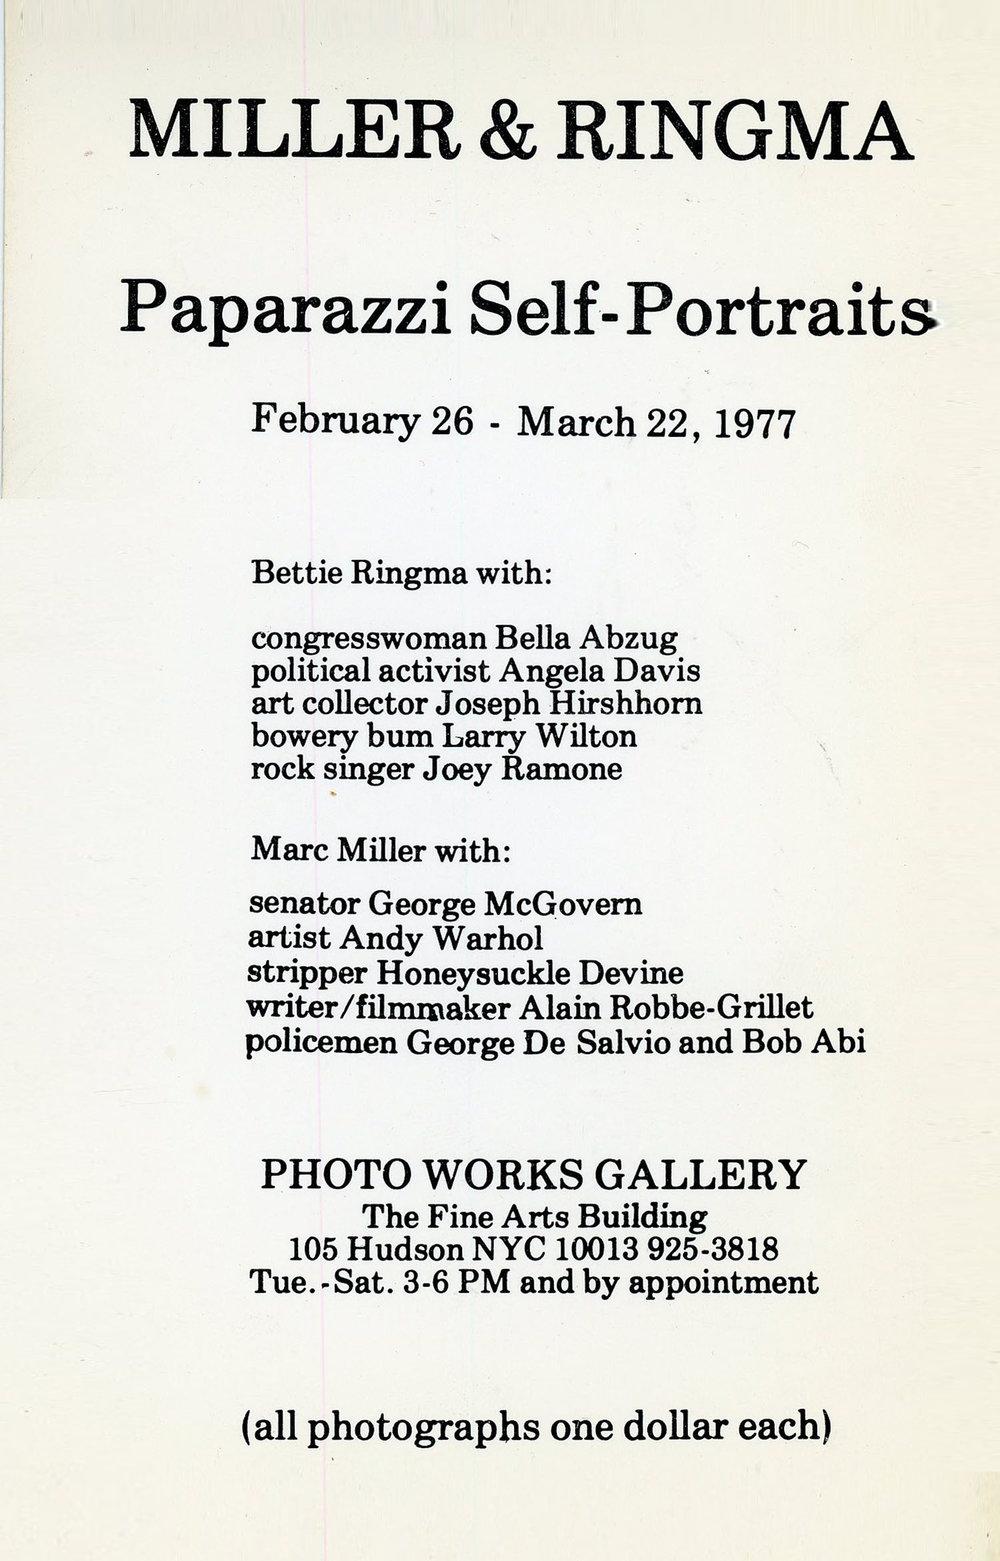 Photo Works Gallery, Miller & Ringma, Paparazzi Self-Portraits, Card, 1977